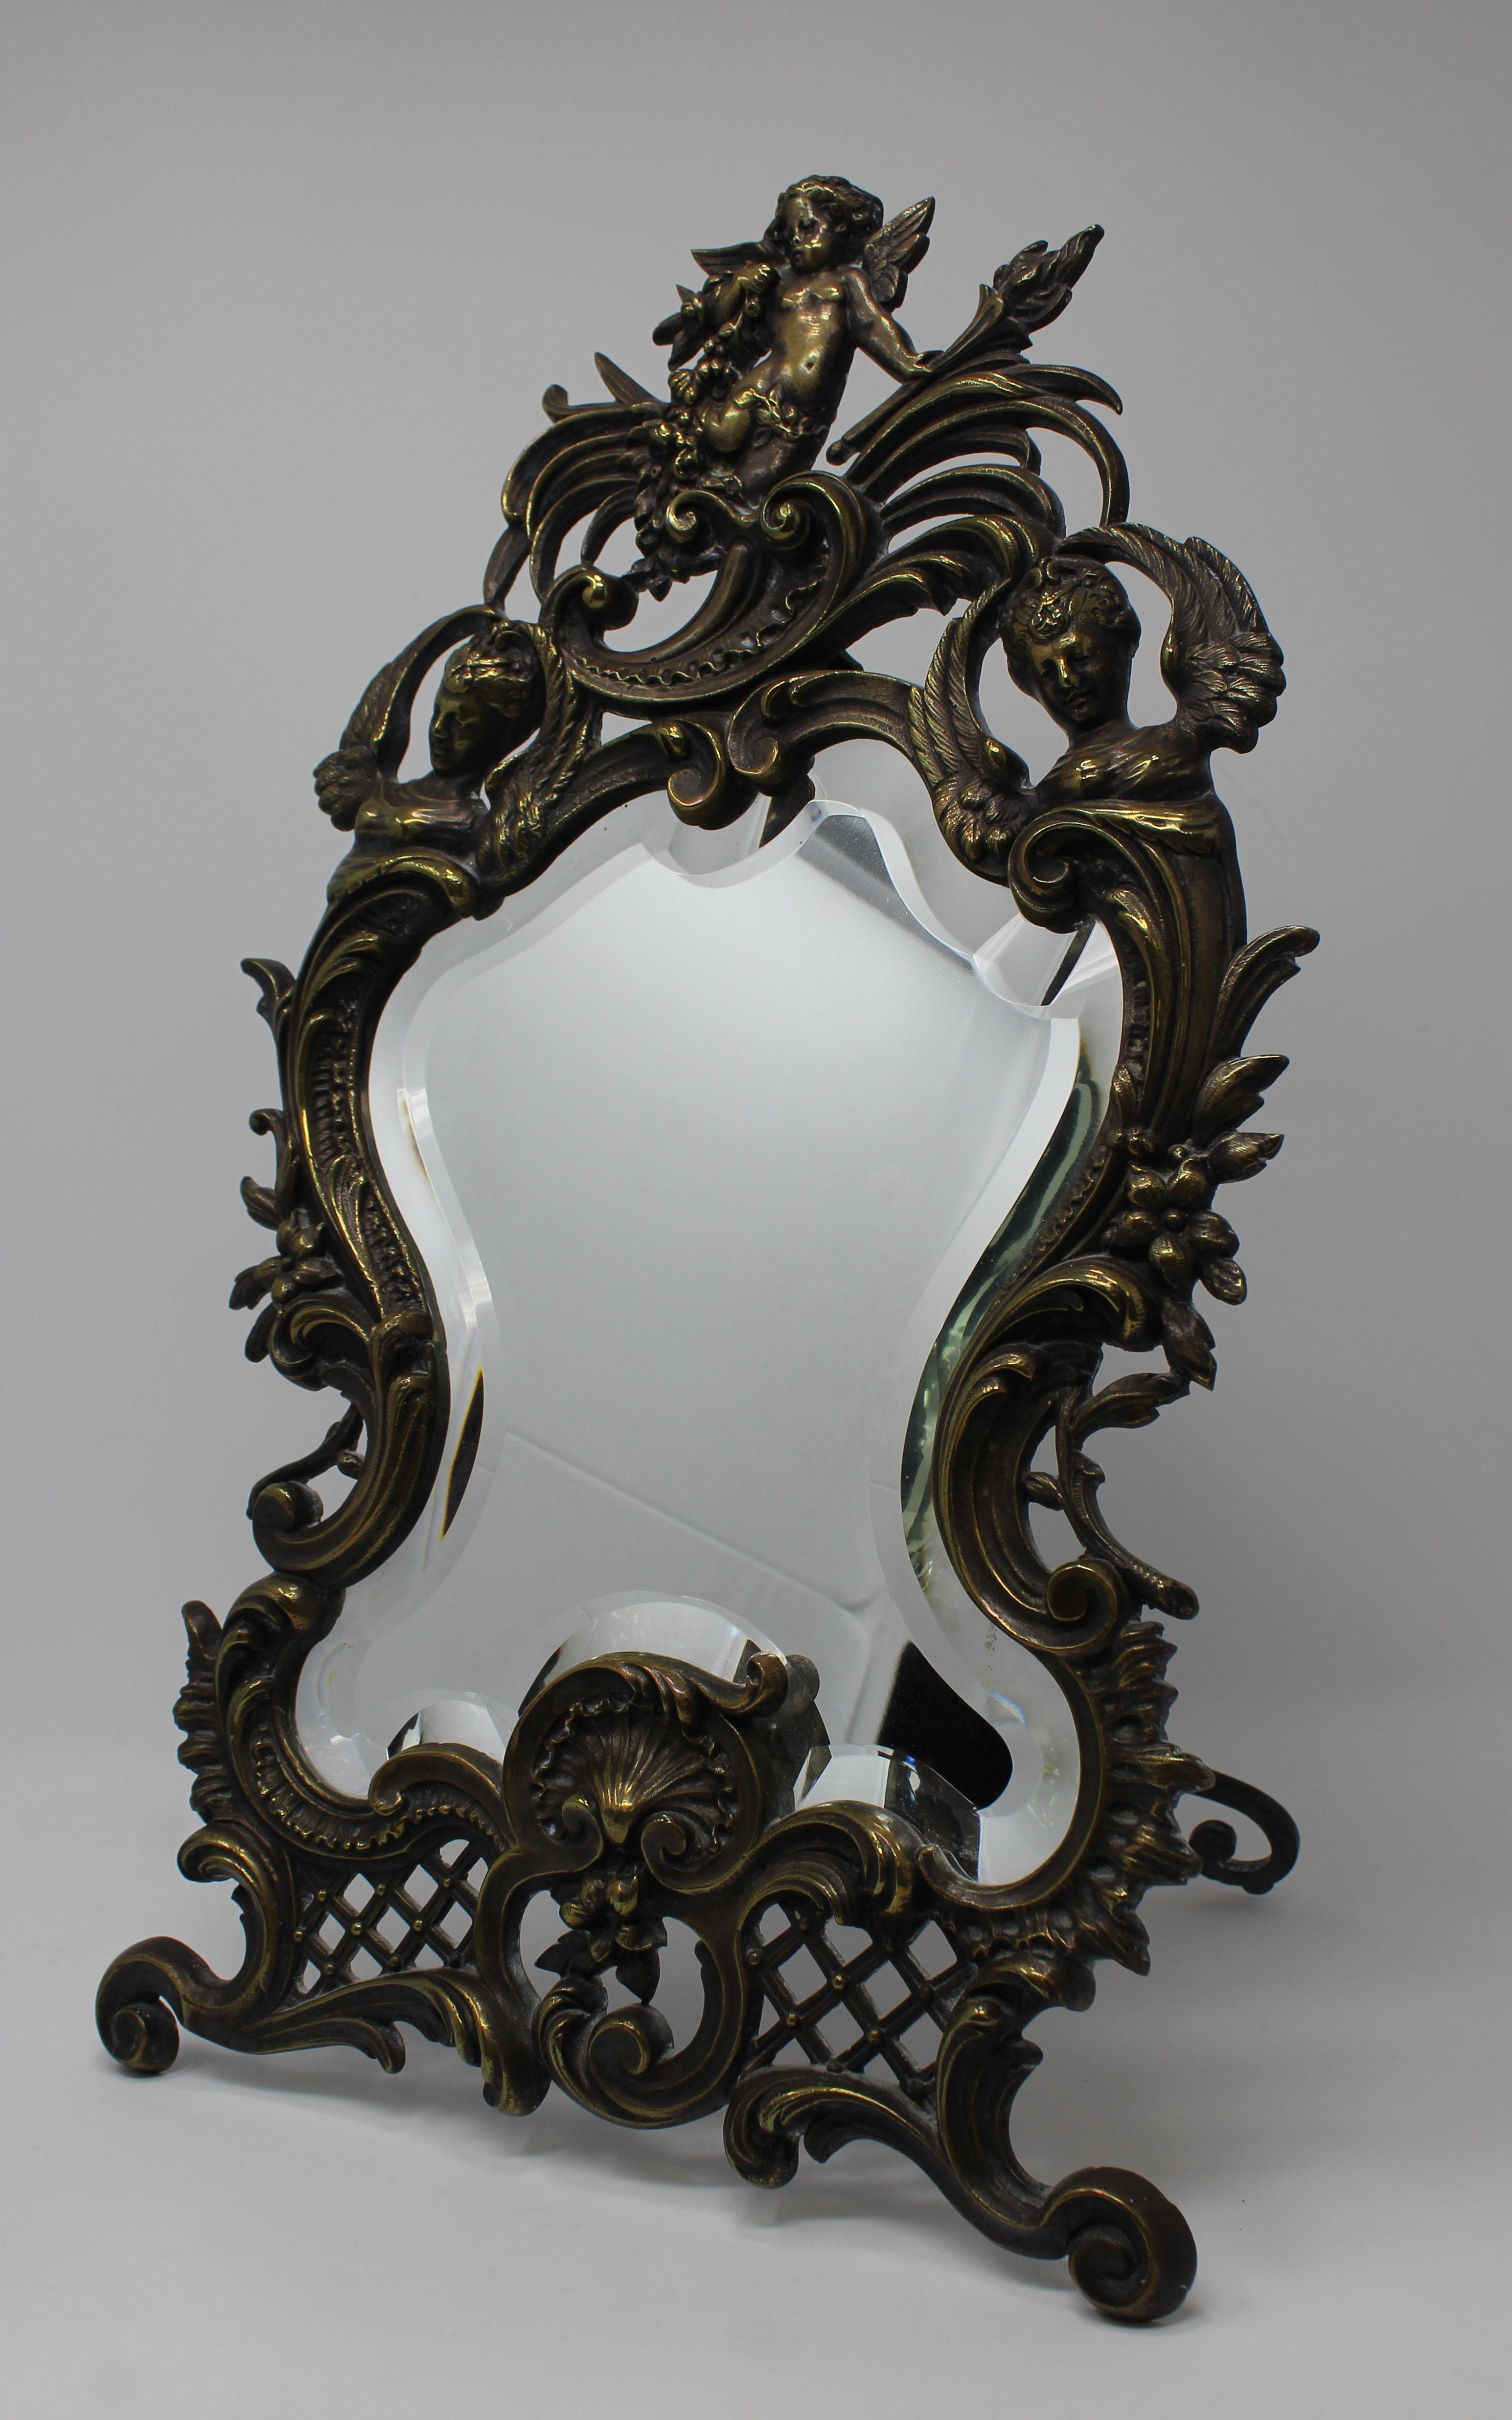 Lot 182 - Antique Louis XV Silvered Bronze Figural Mirror